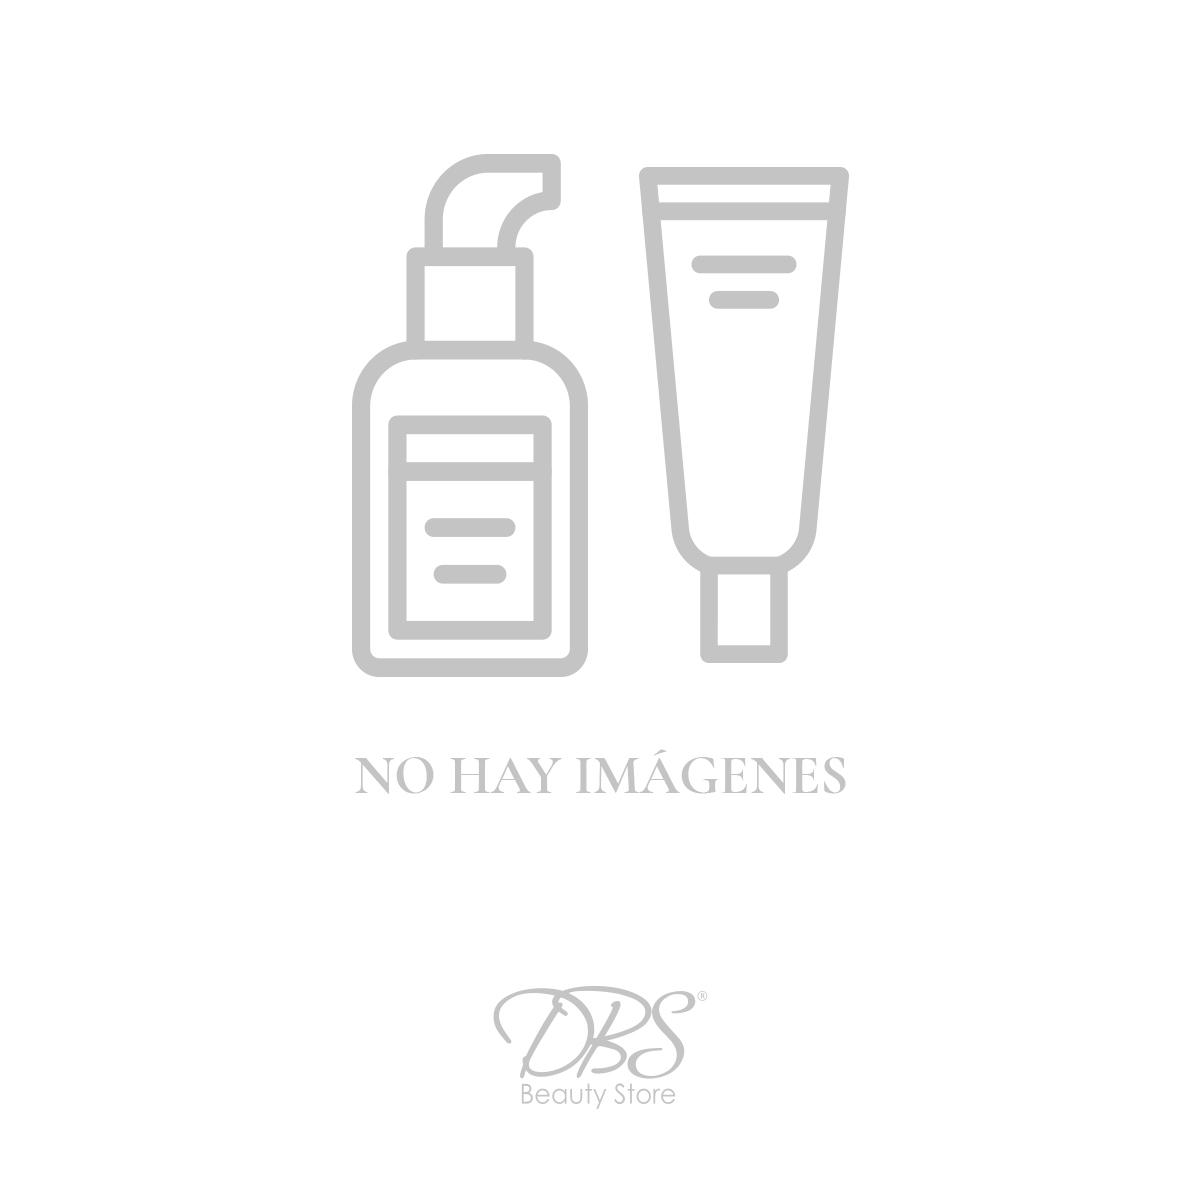 makeup-revolution-RT-31313.jpg